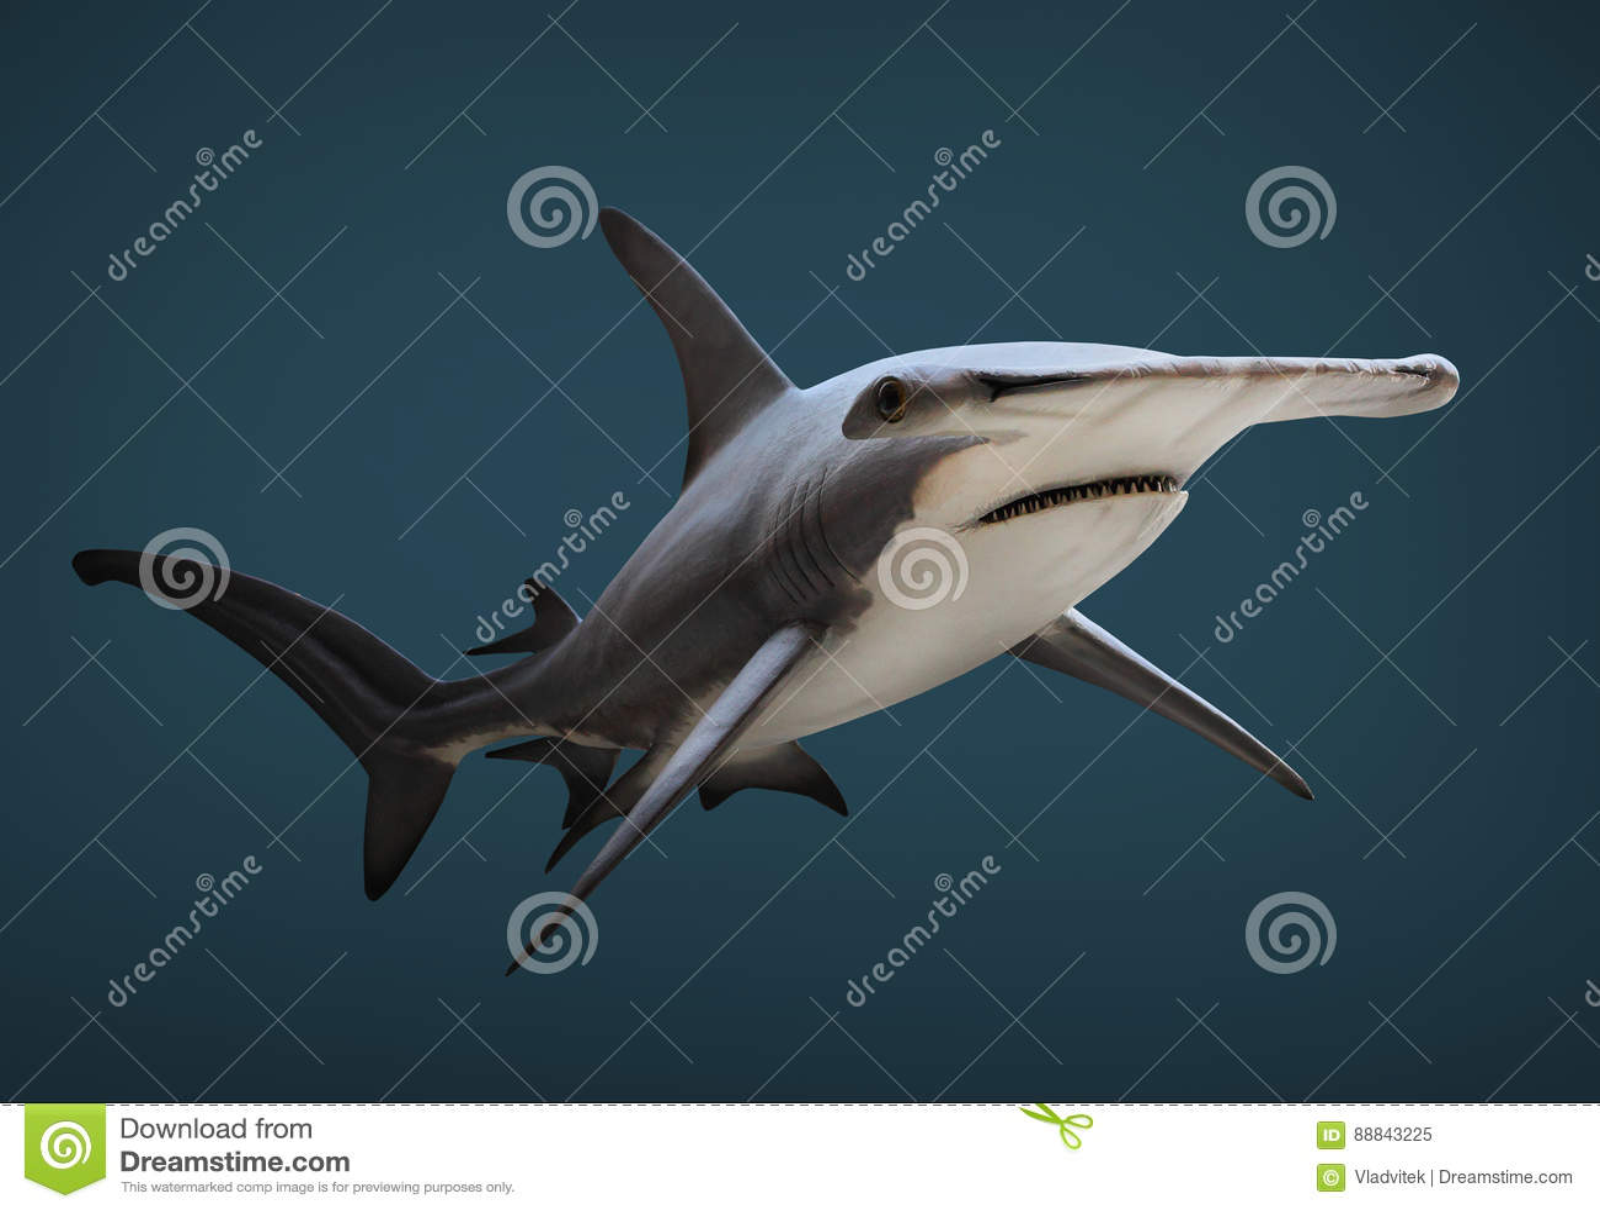 The Great Hammerhead Shark. Stock Image - Image of destination ...